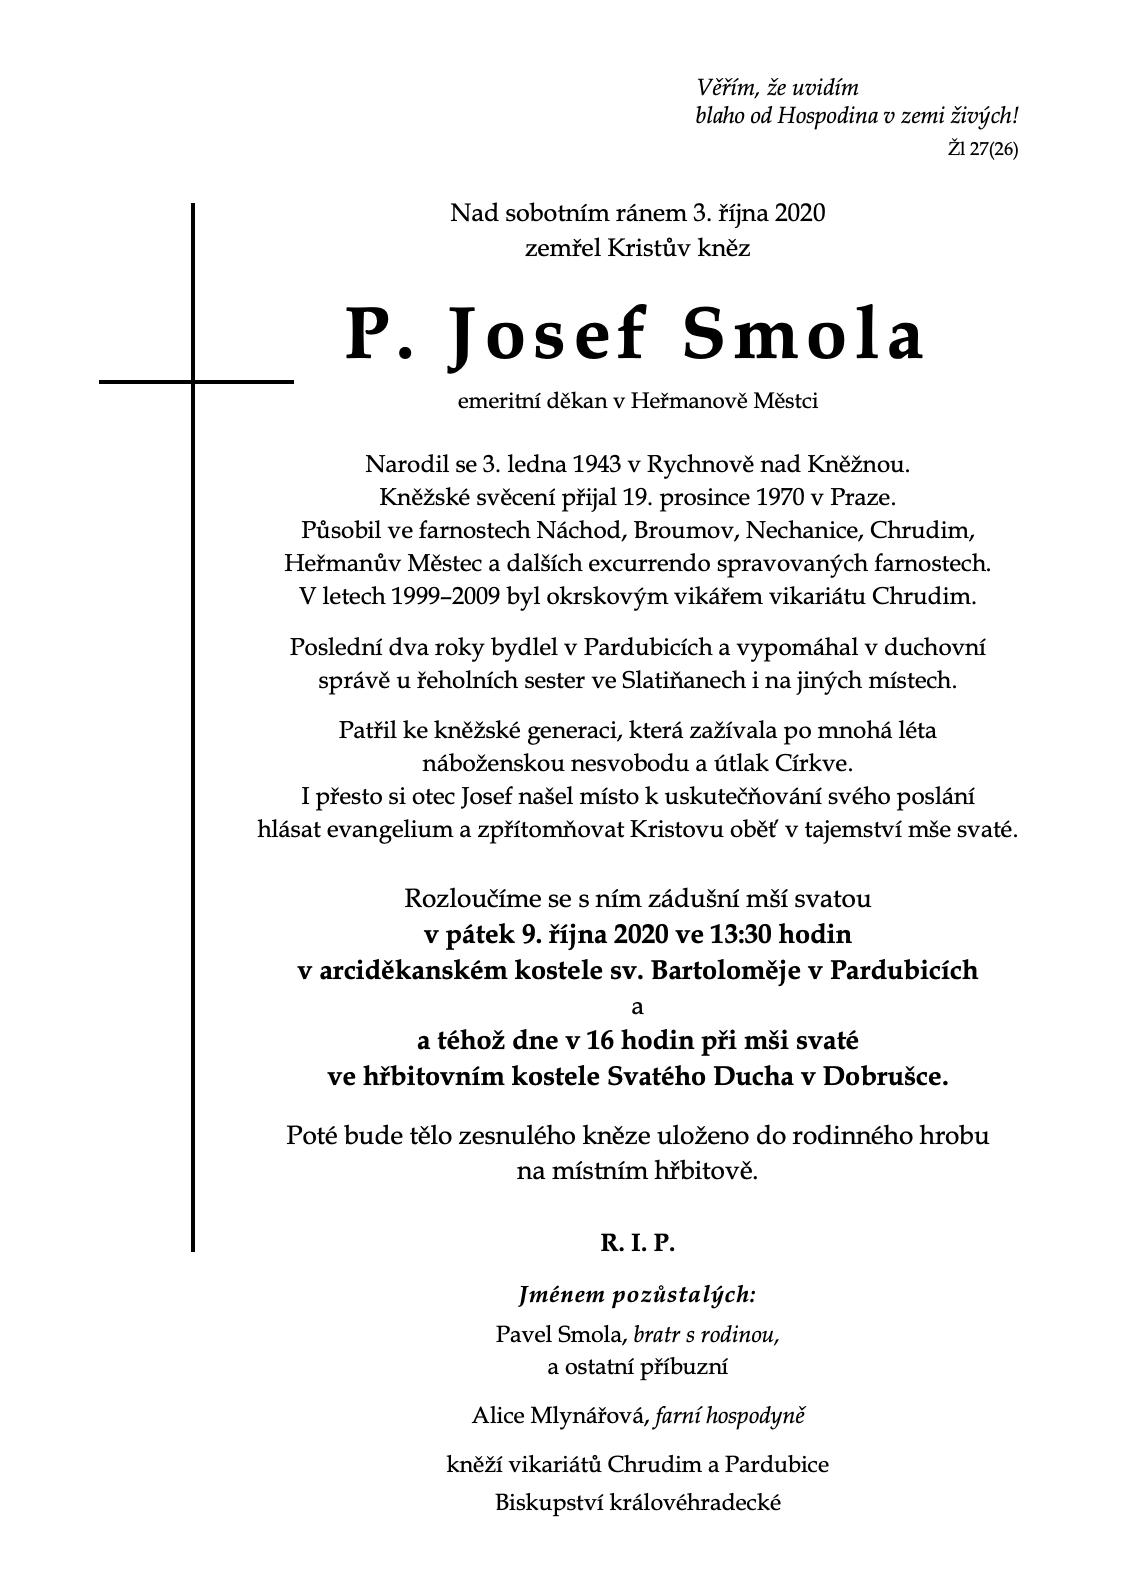 + P. Josef Smola